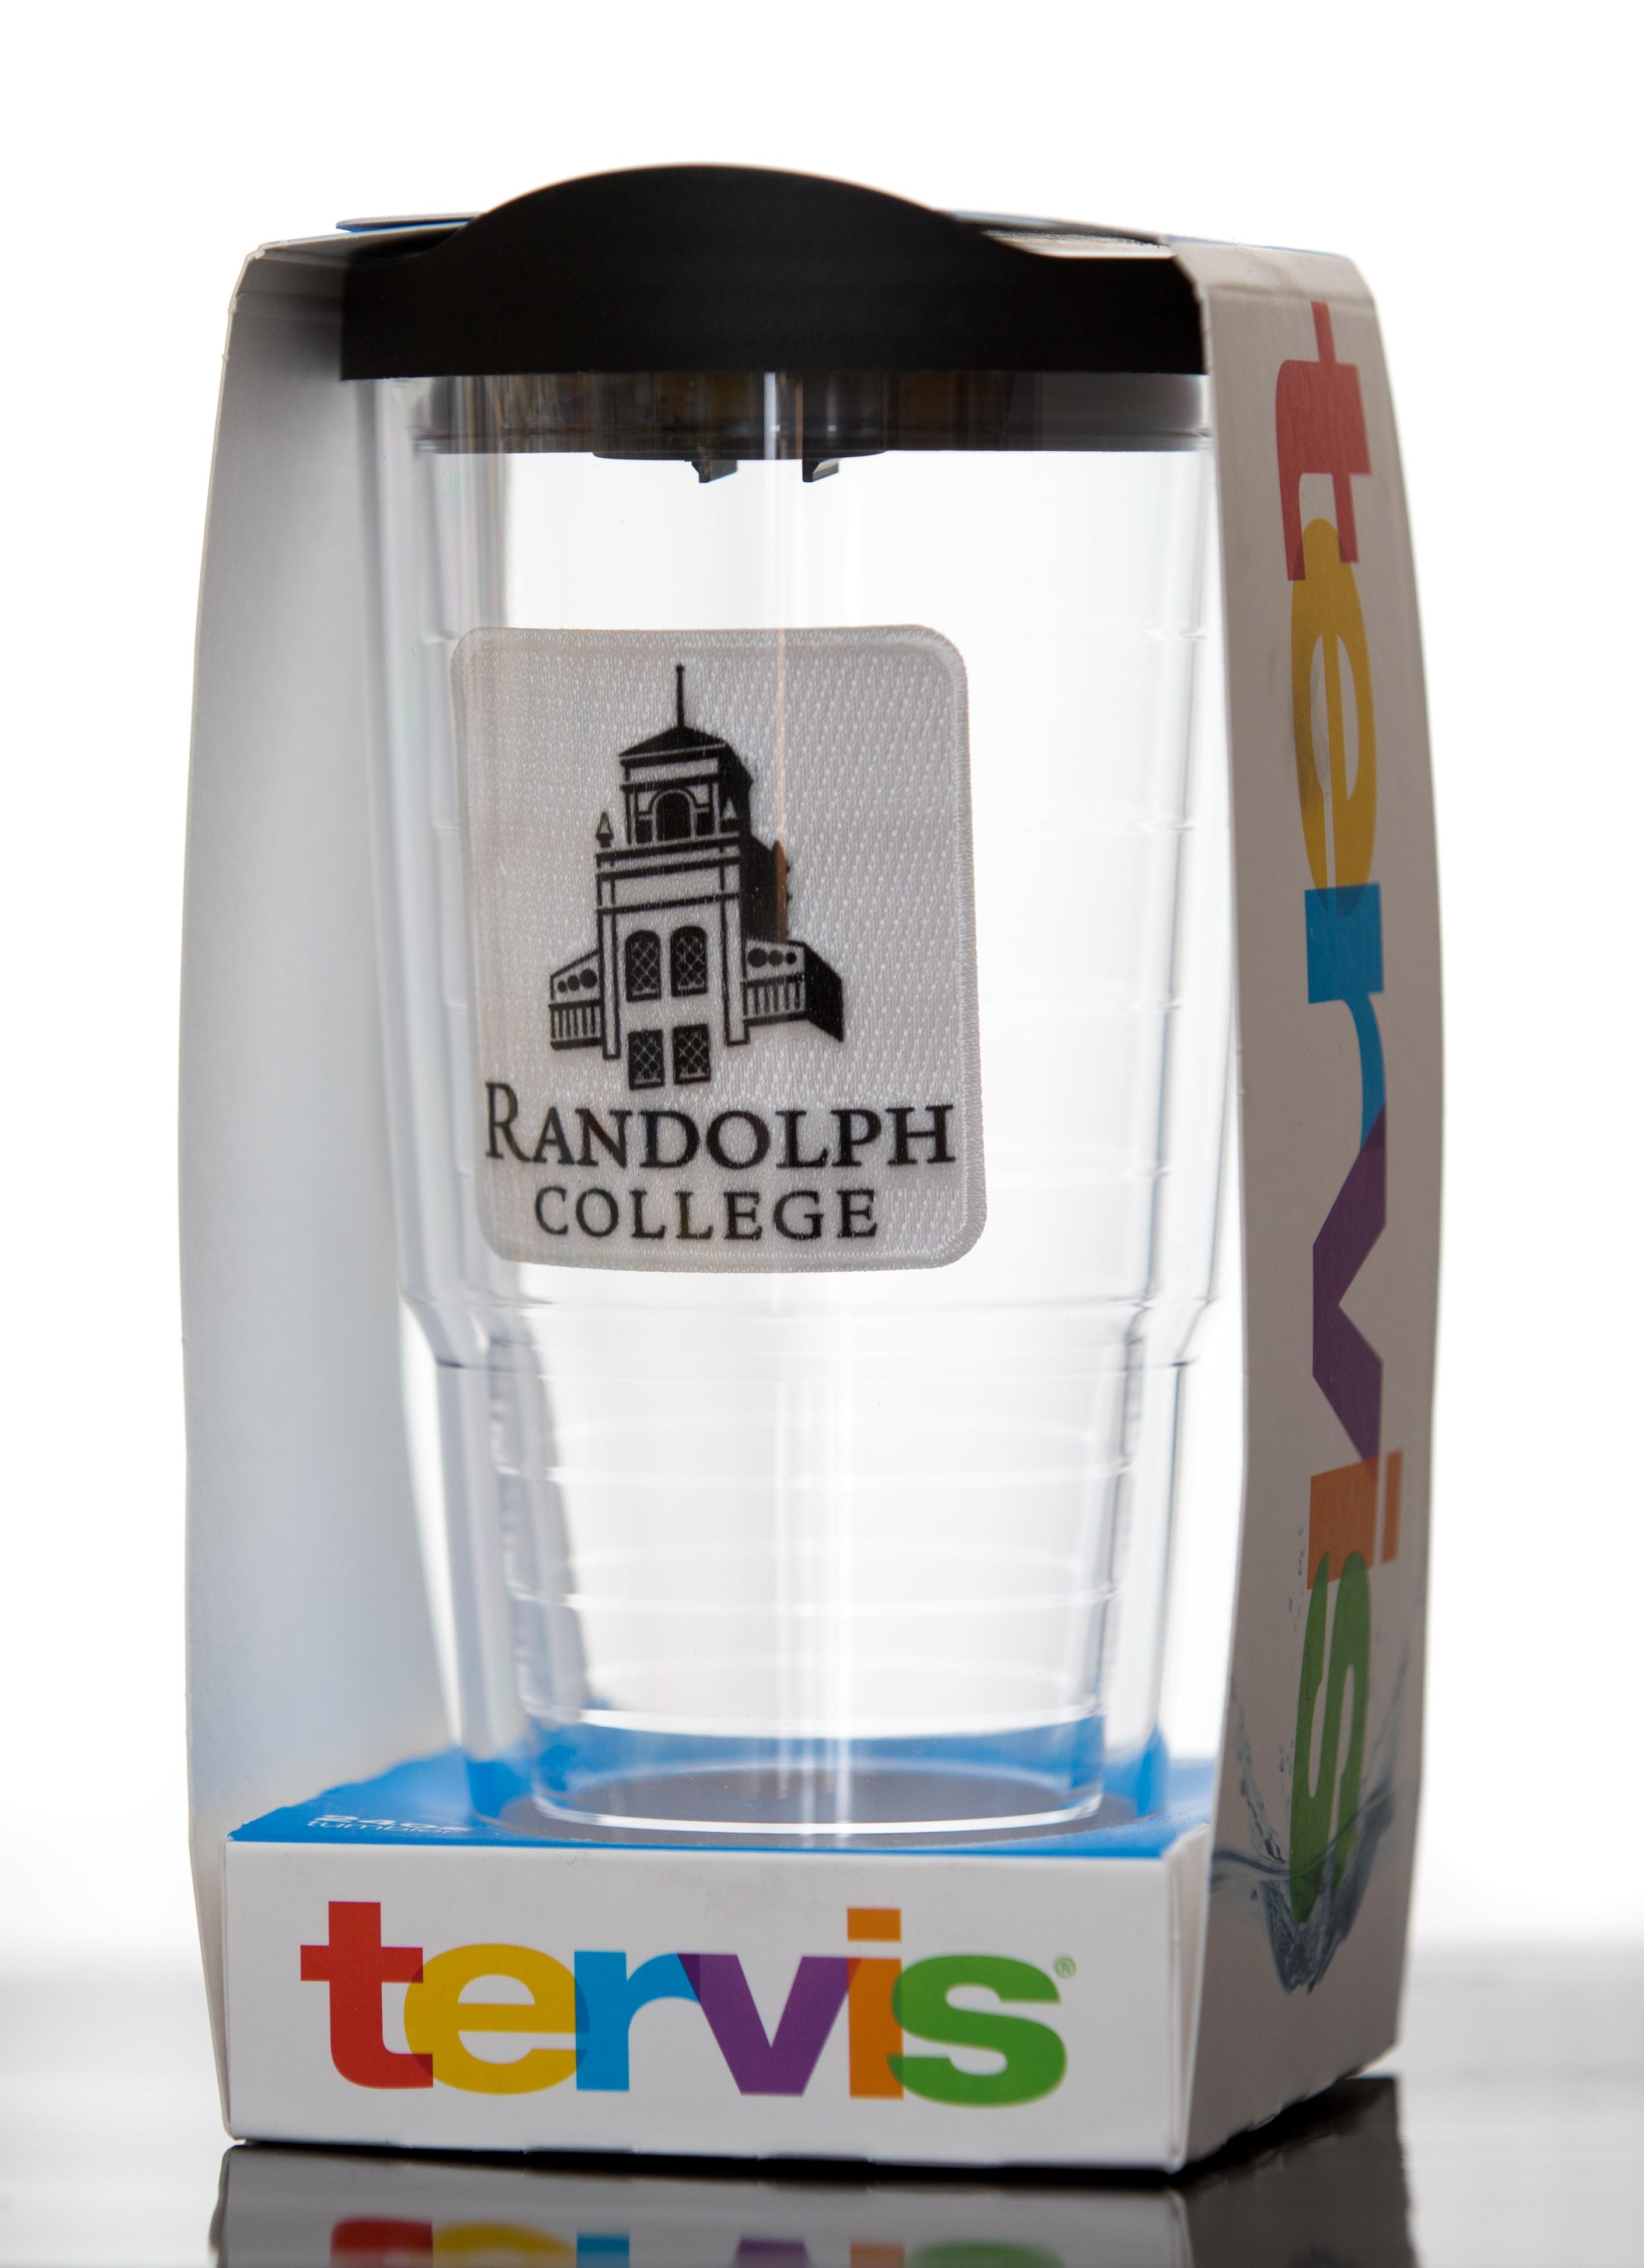 Randolph College Tervis Tumbler